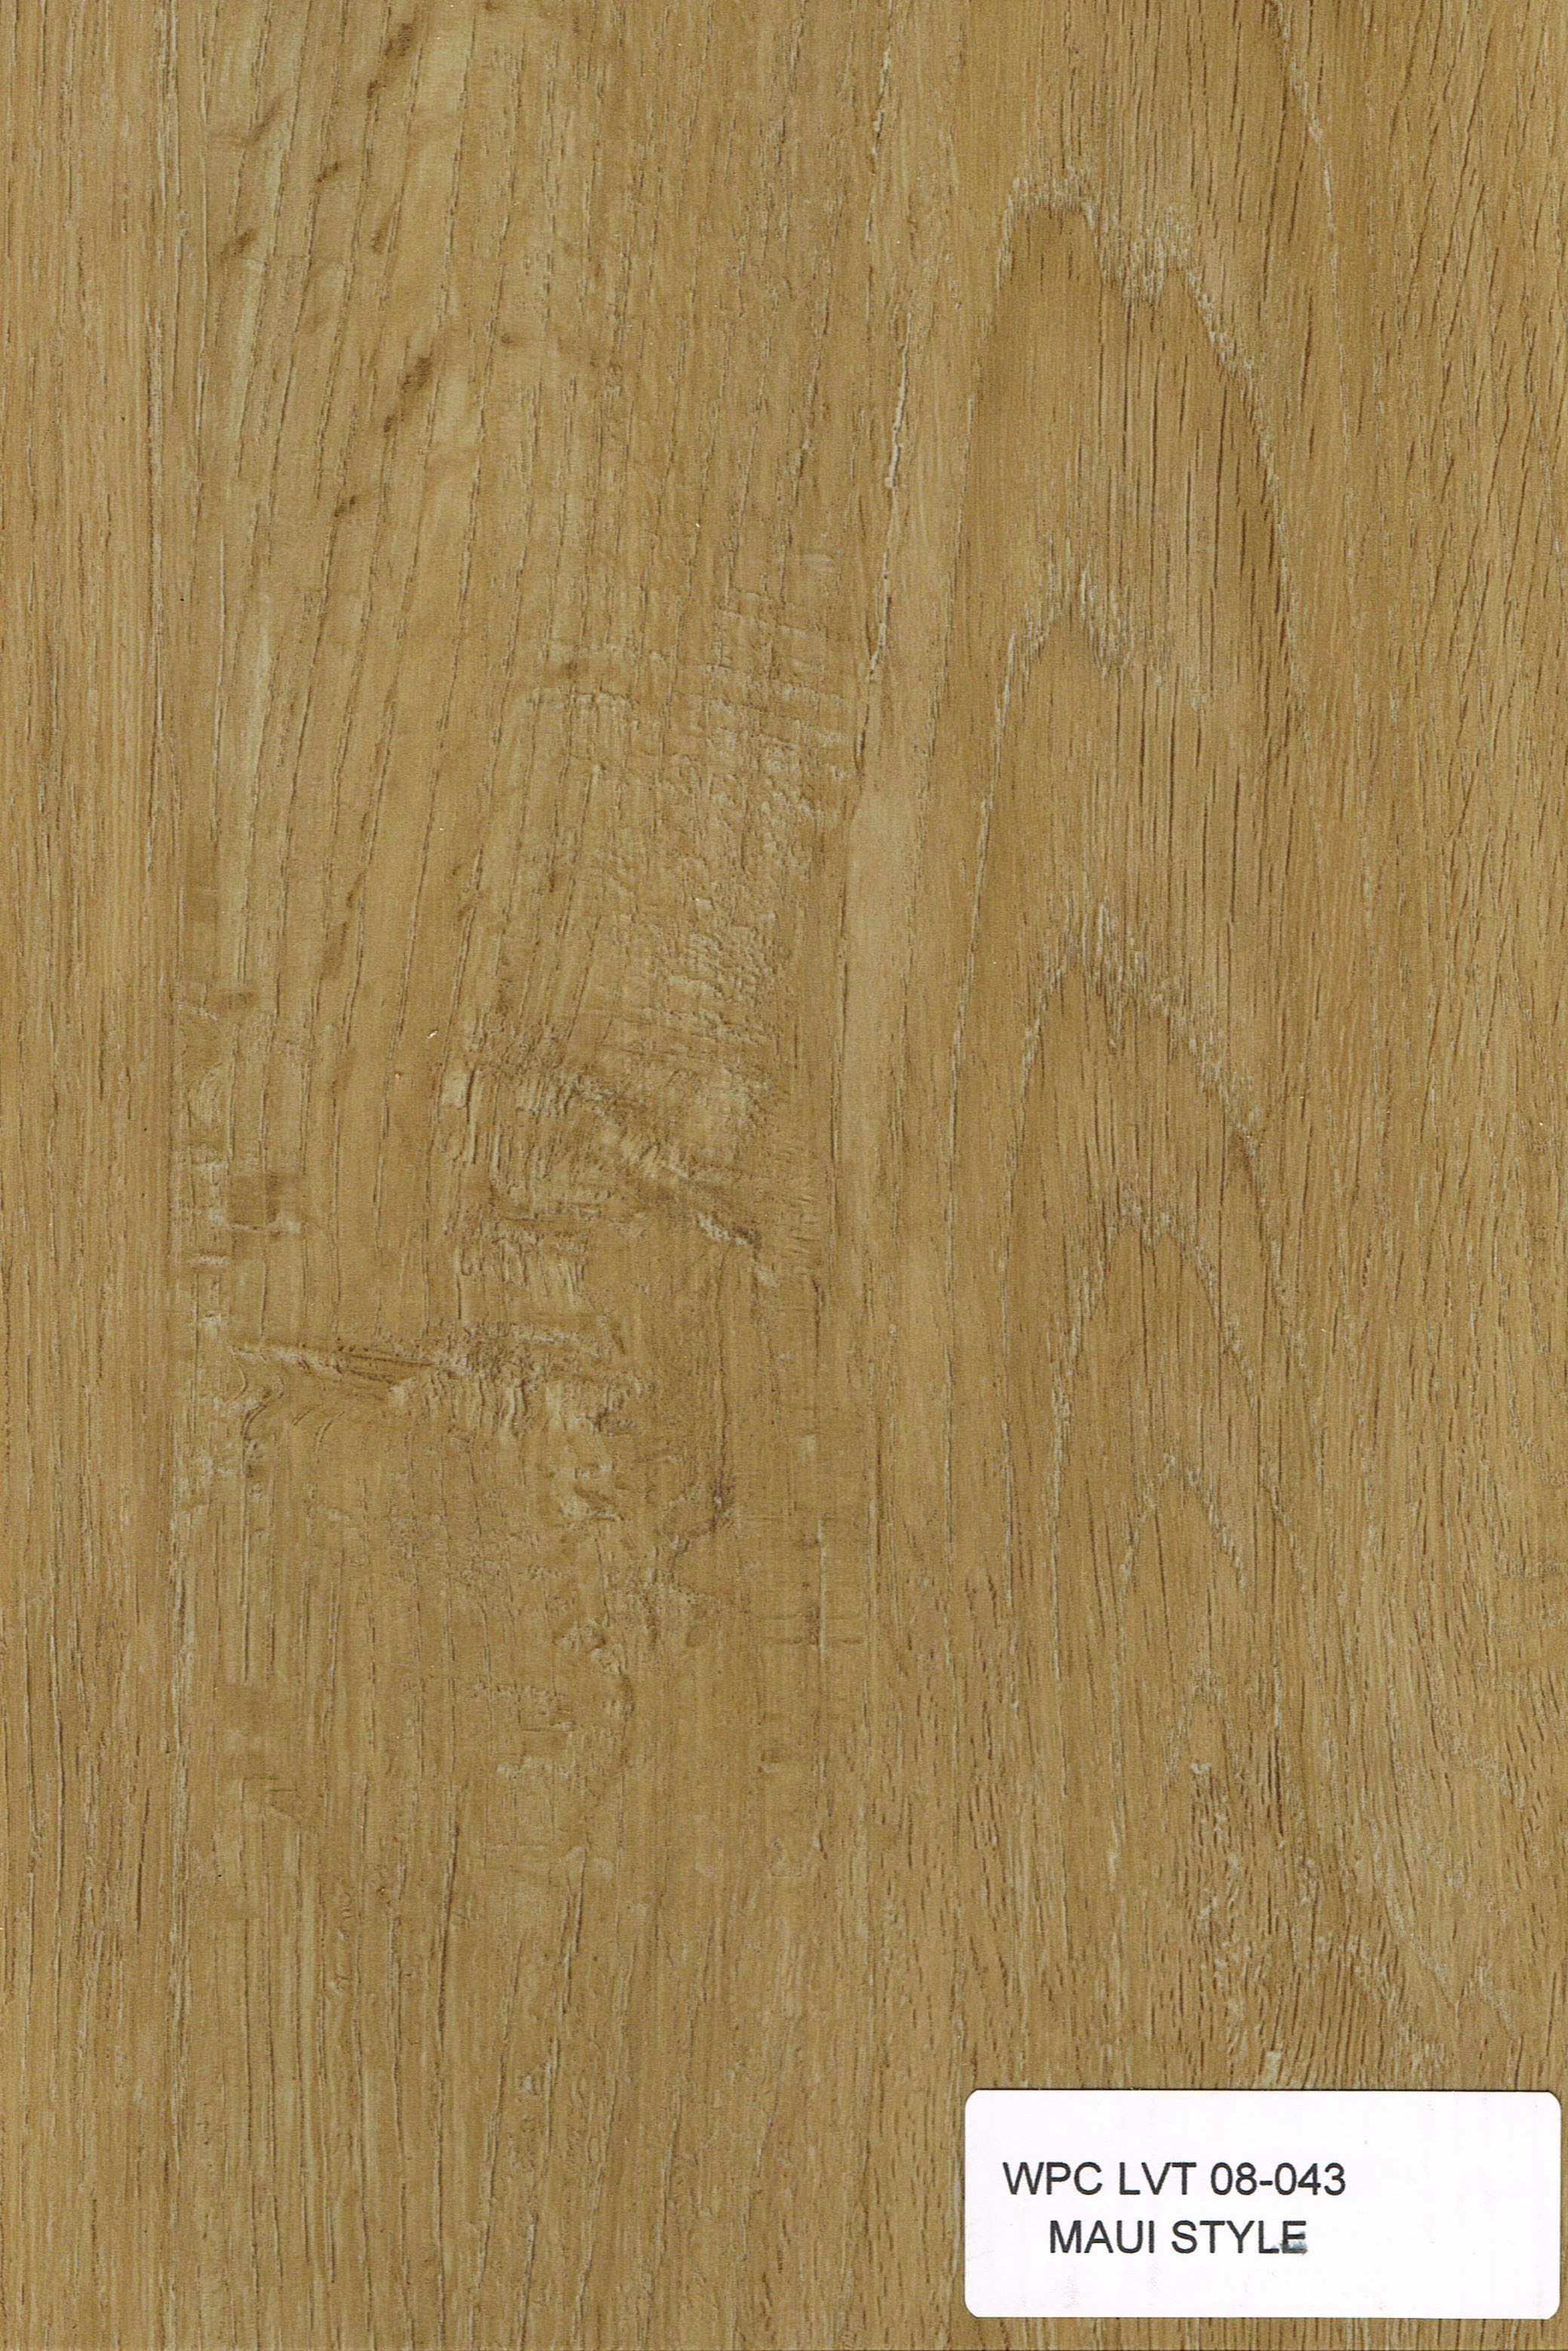 Bamboo Flooring Maui Ourcozycatcottagecom